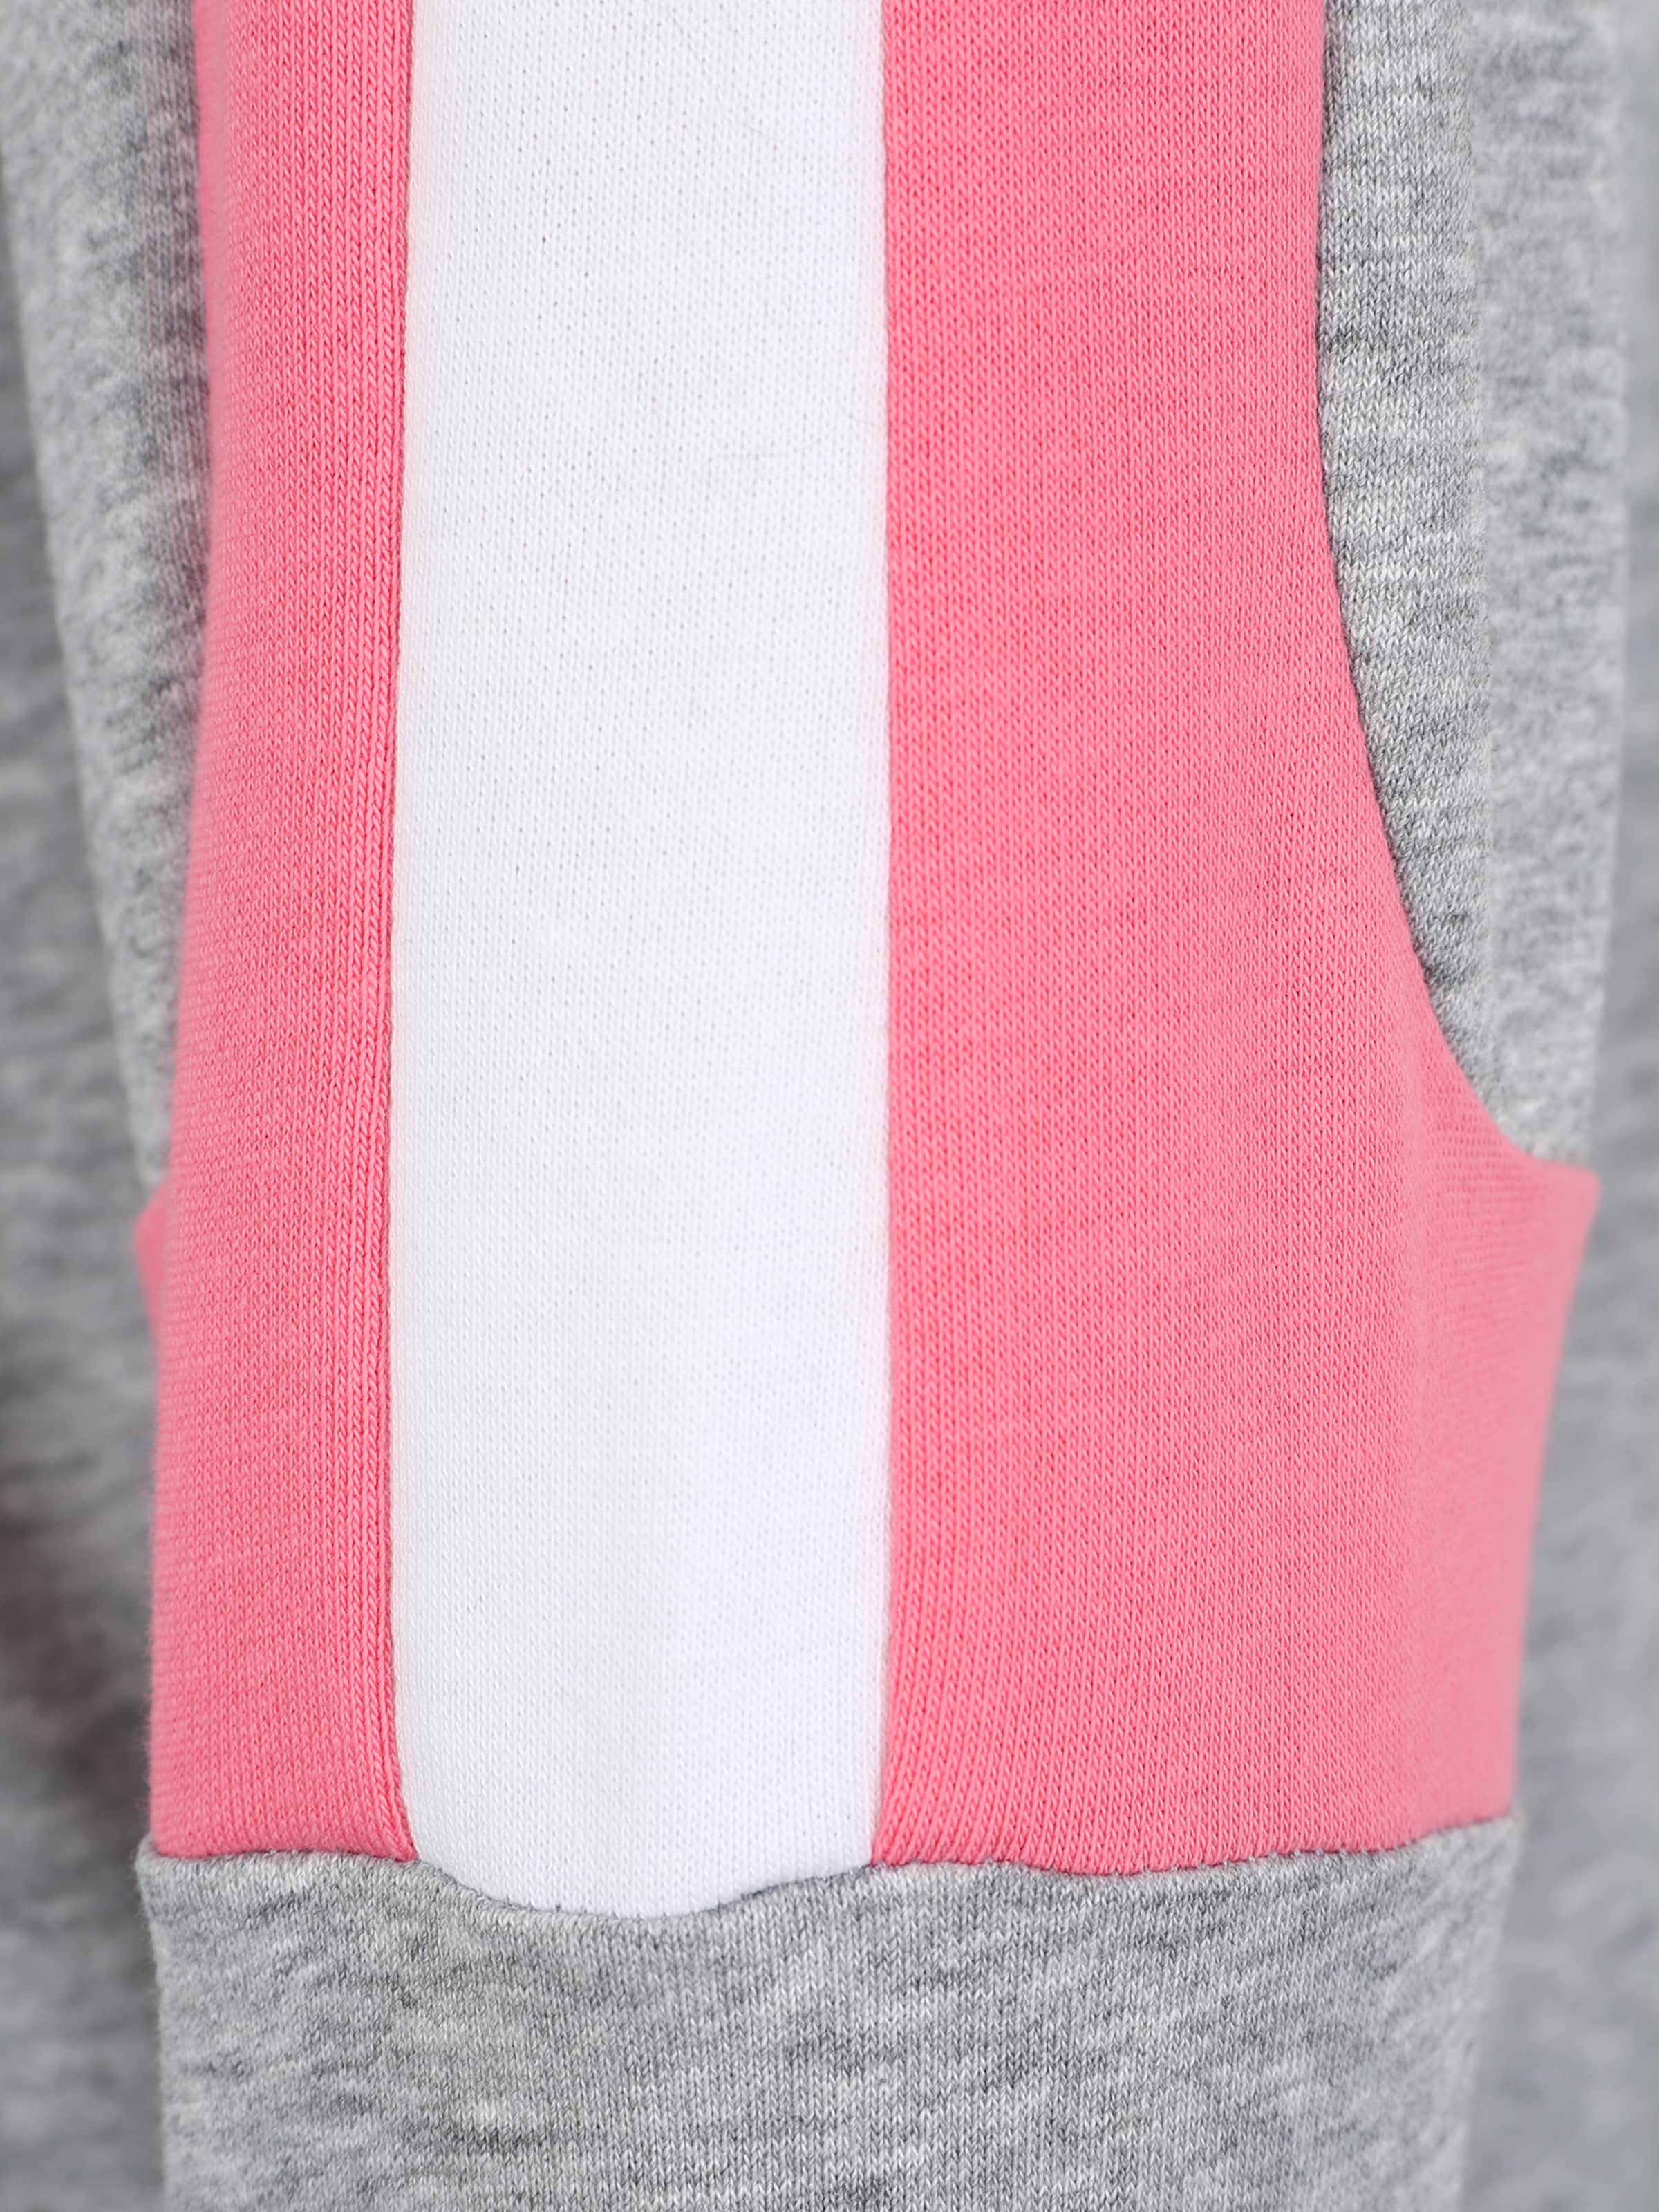 GrisRose Classics En Urban Panel Sweat 'ladies Crewneck' Terry Blanc Curvy shirt 3qScR54AjL